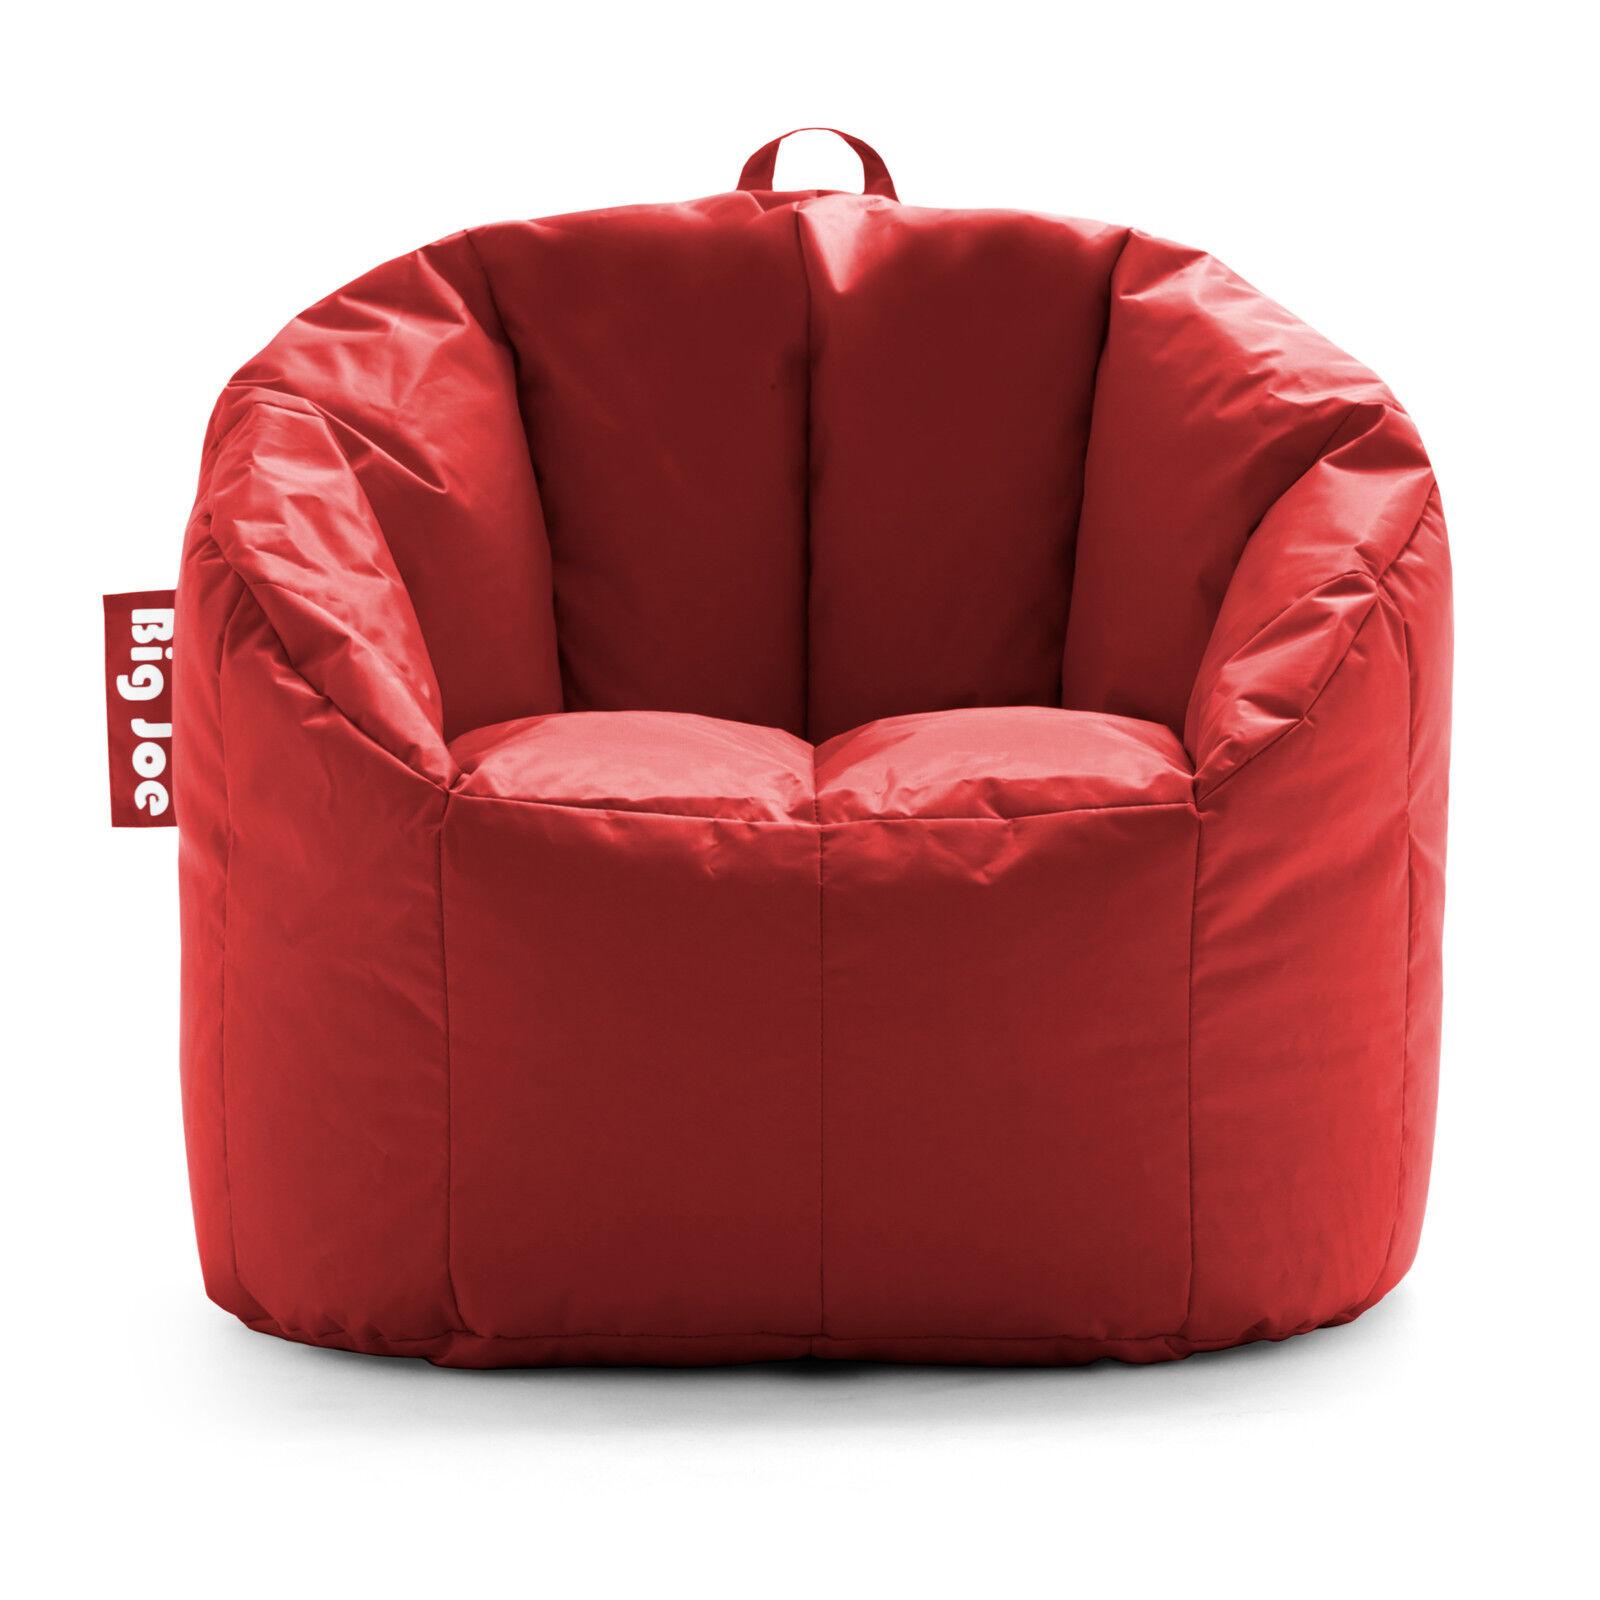 Big Joe Milano Bean Bag Chair Red Color Living Room Home Soft Comfortable Indoor